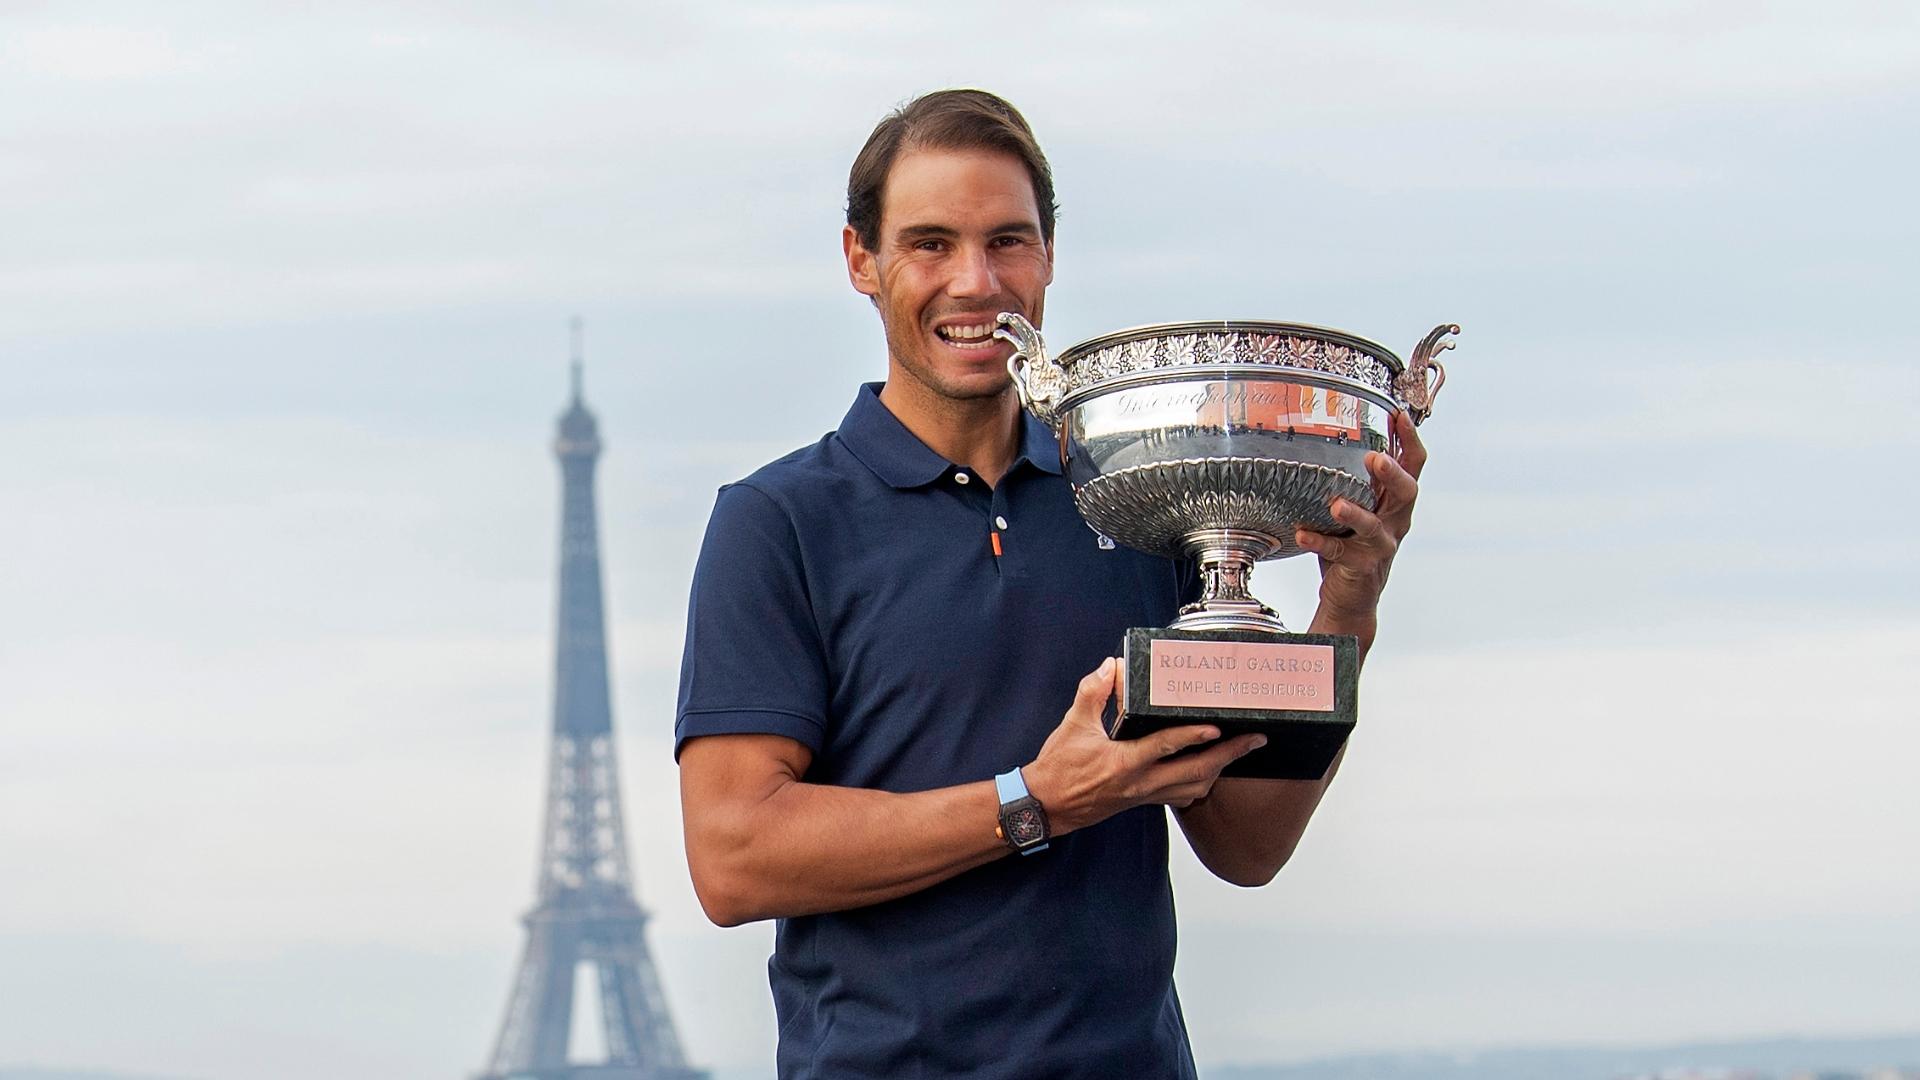 Rafael Nadal is the pride of Spain – Luis Enrique